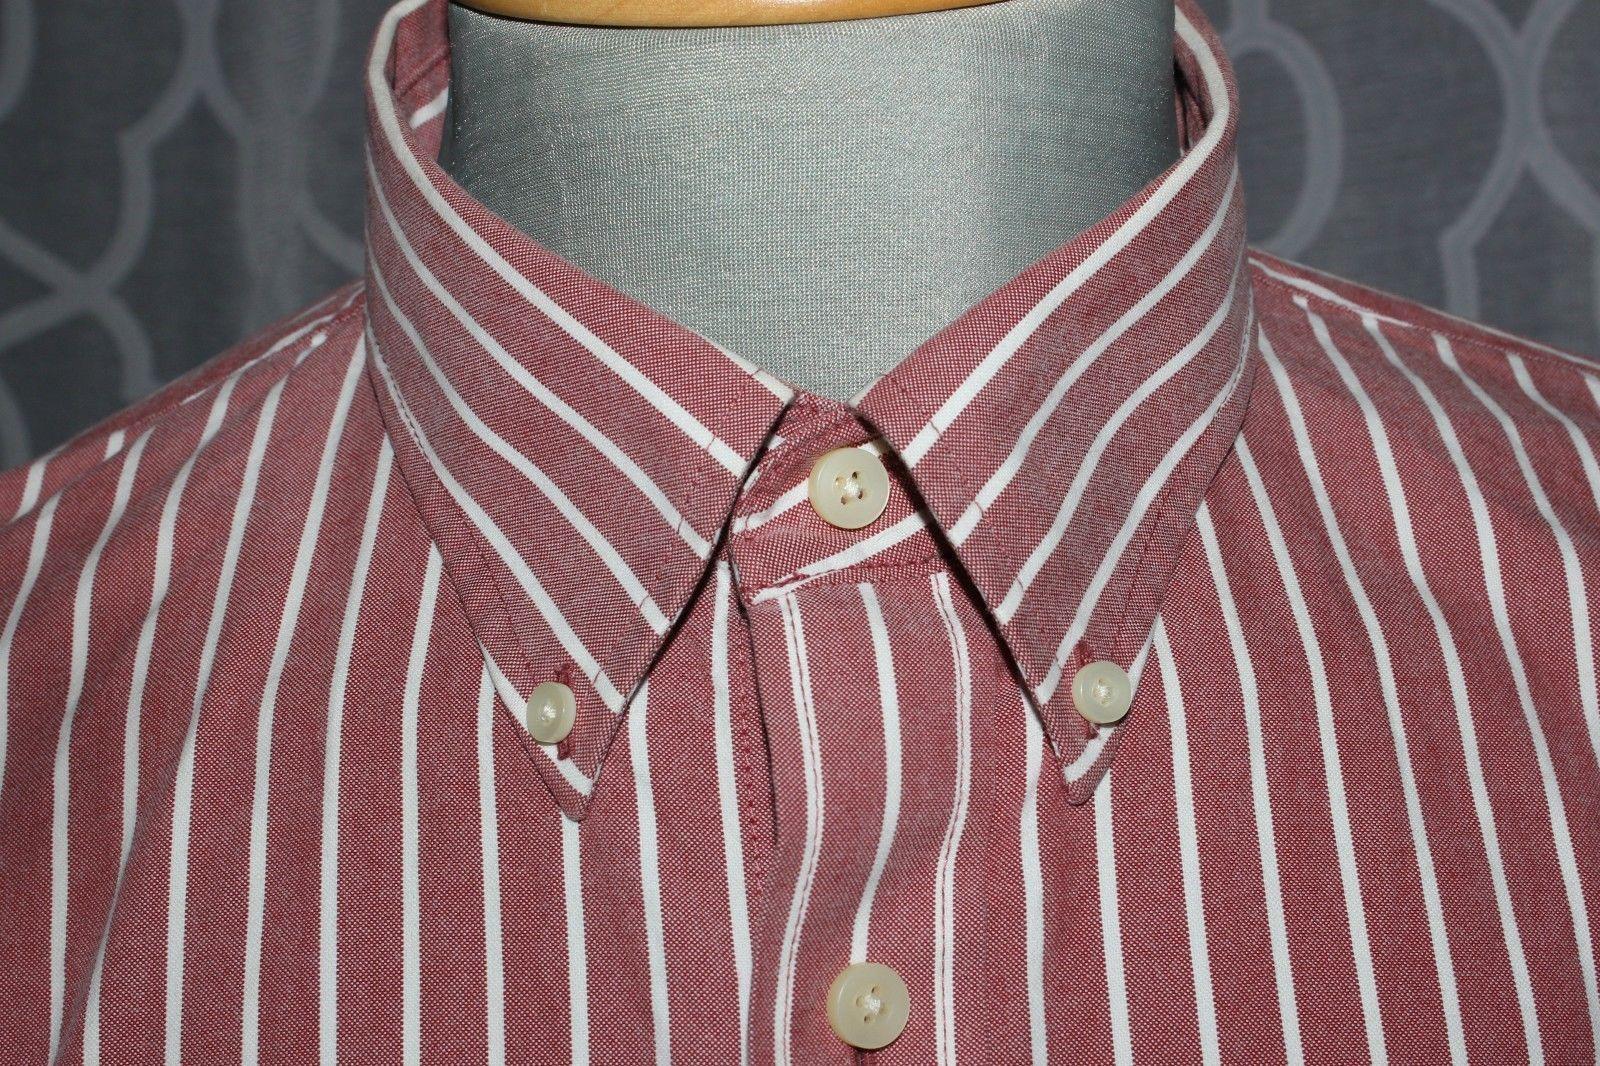 Abercrombie & Fitch Men's Muscle Long Sleeve Shirt Stripes Button Down Size XXL